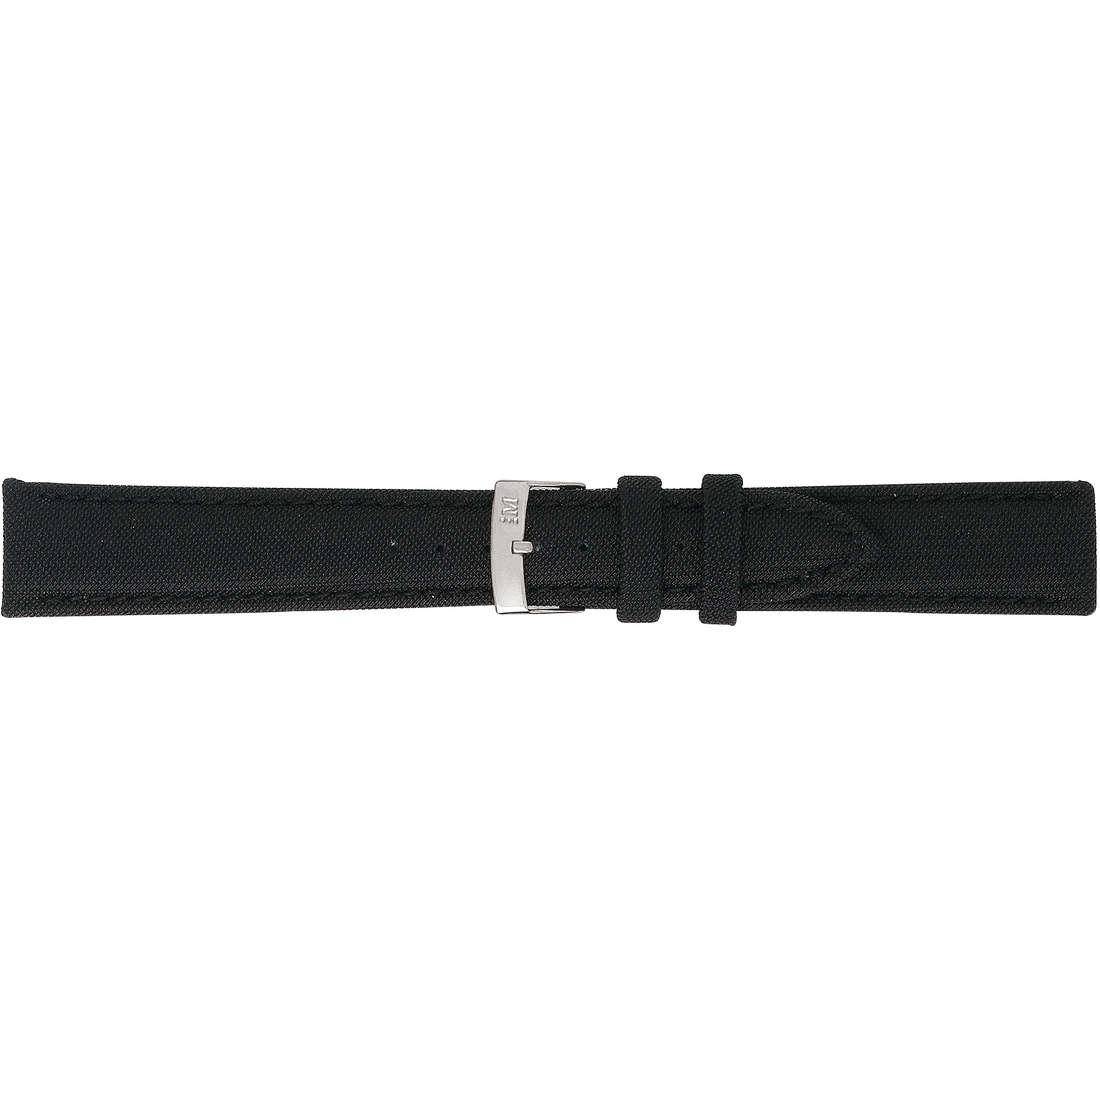 watch watch bands watch straps man Morellato Linea Sport A01X2778841019CR16